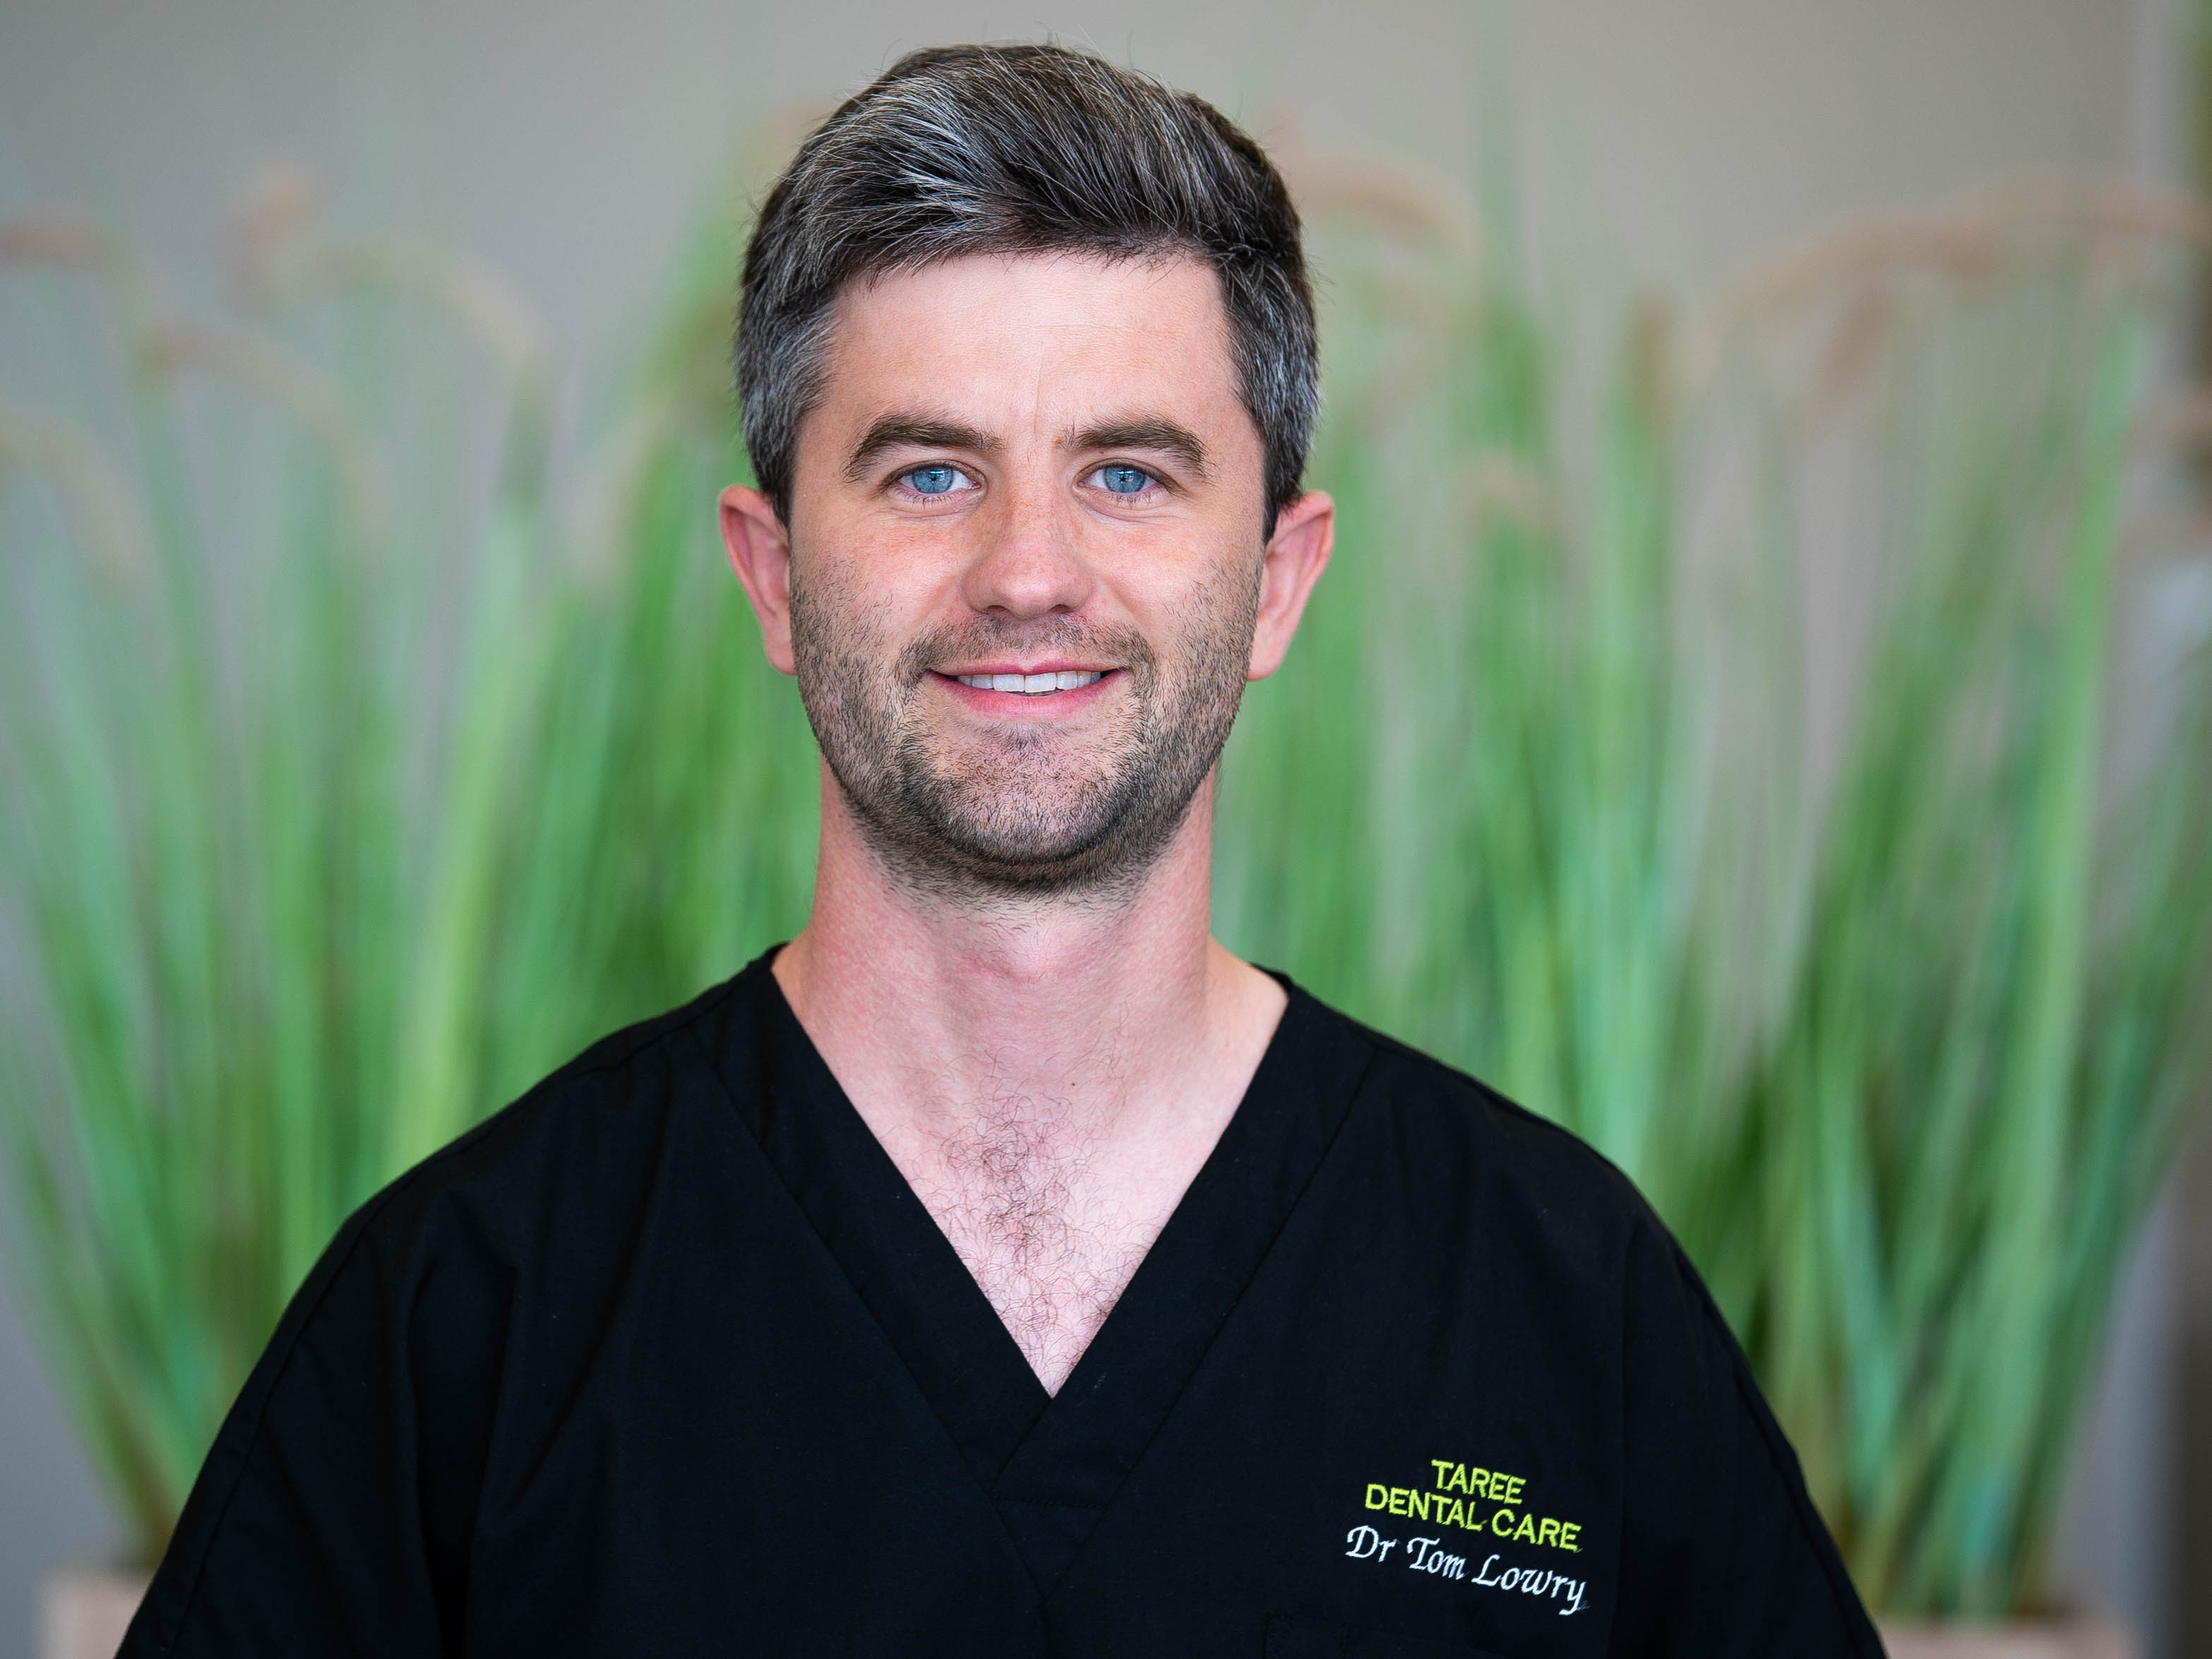 Dr Tom Lowry